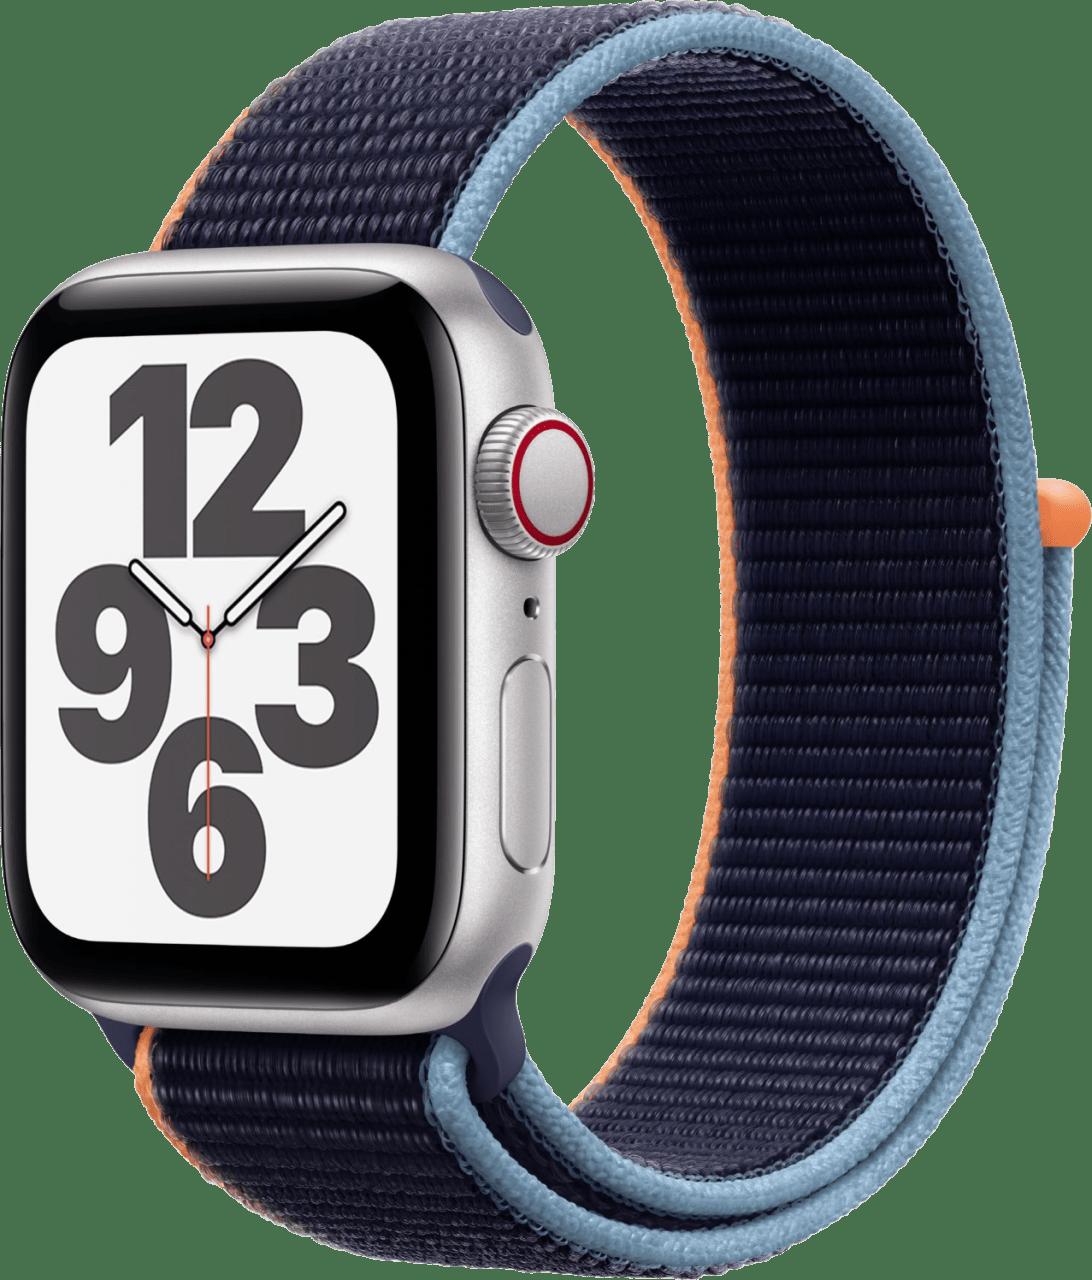 Dark marine Apple Watch SE GPS + Cellular, 44mm Aluminium case, Sport loop / band.1